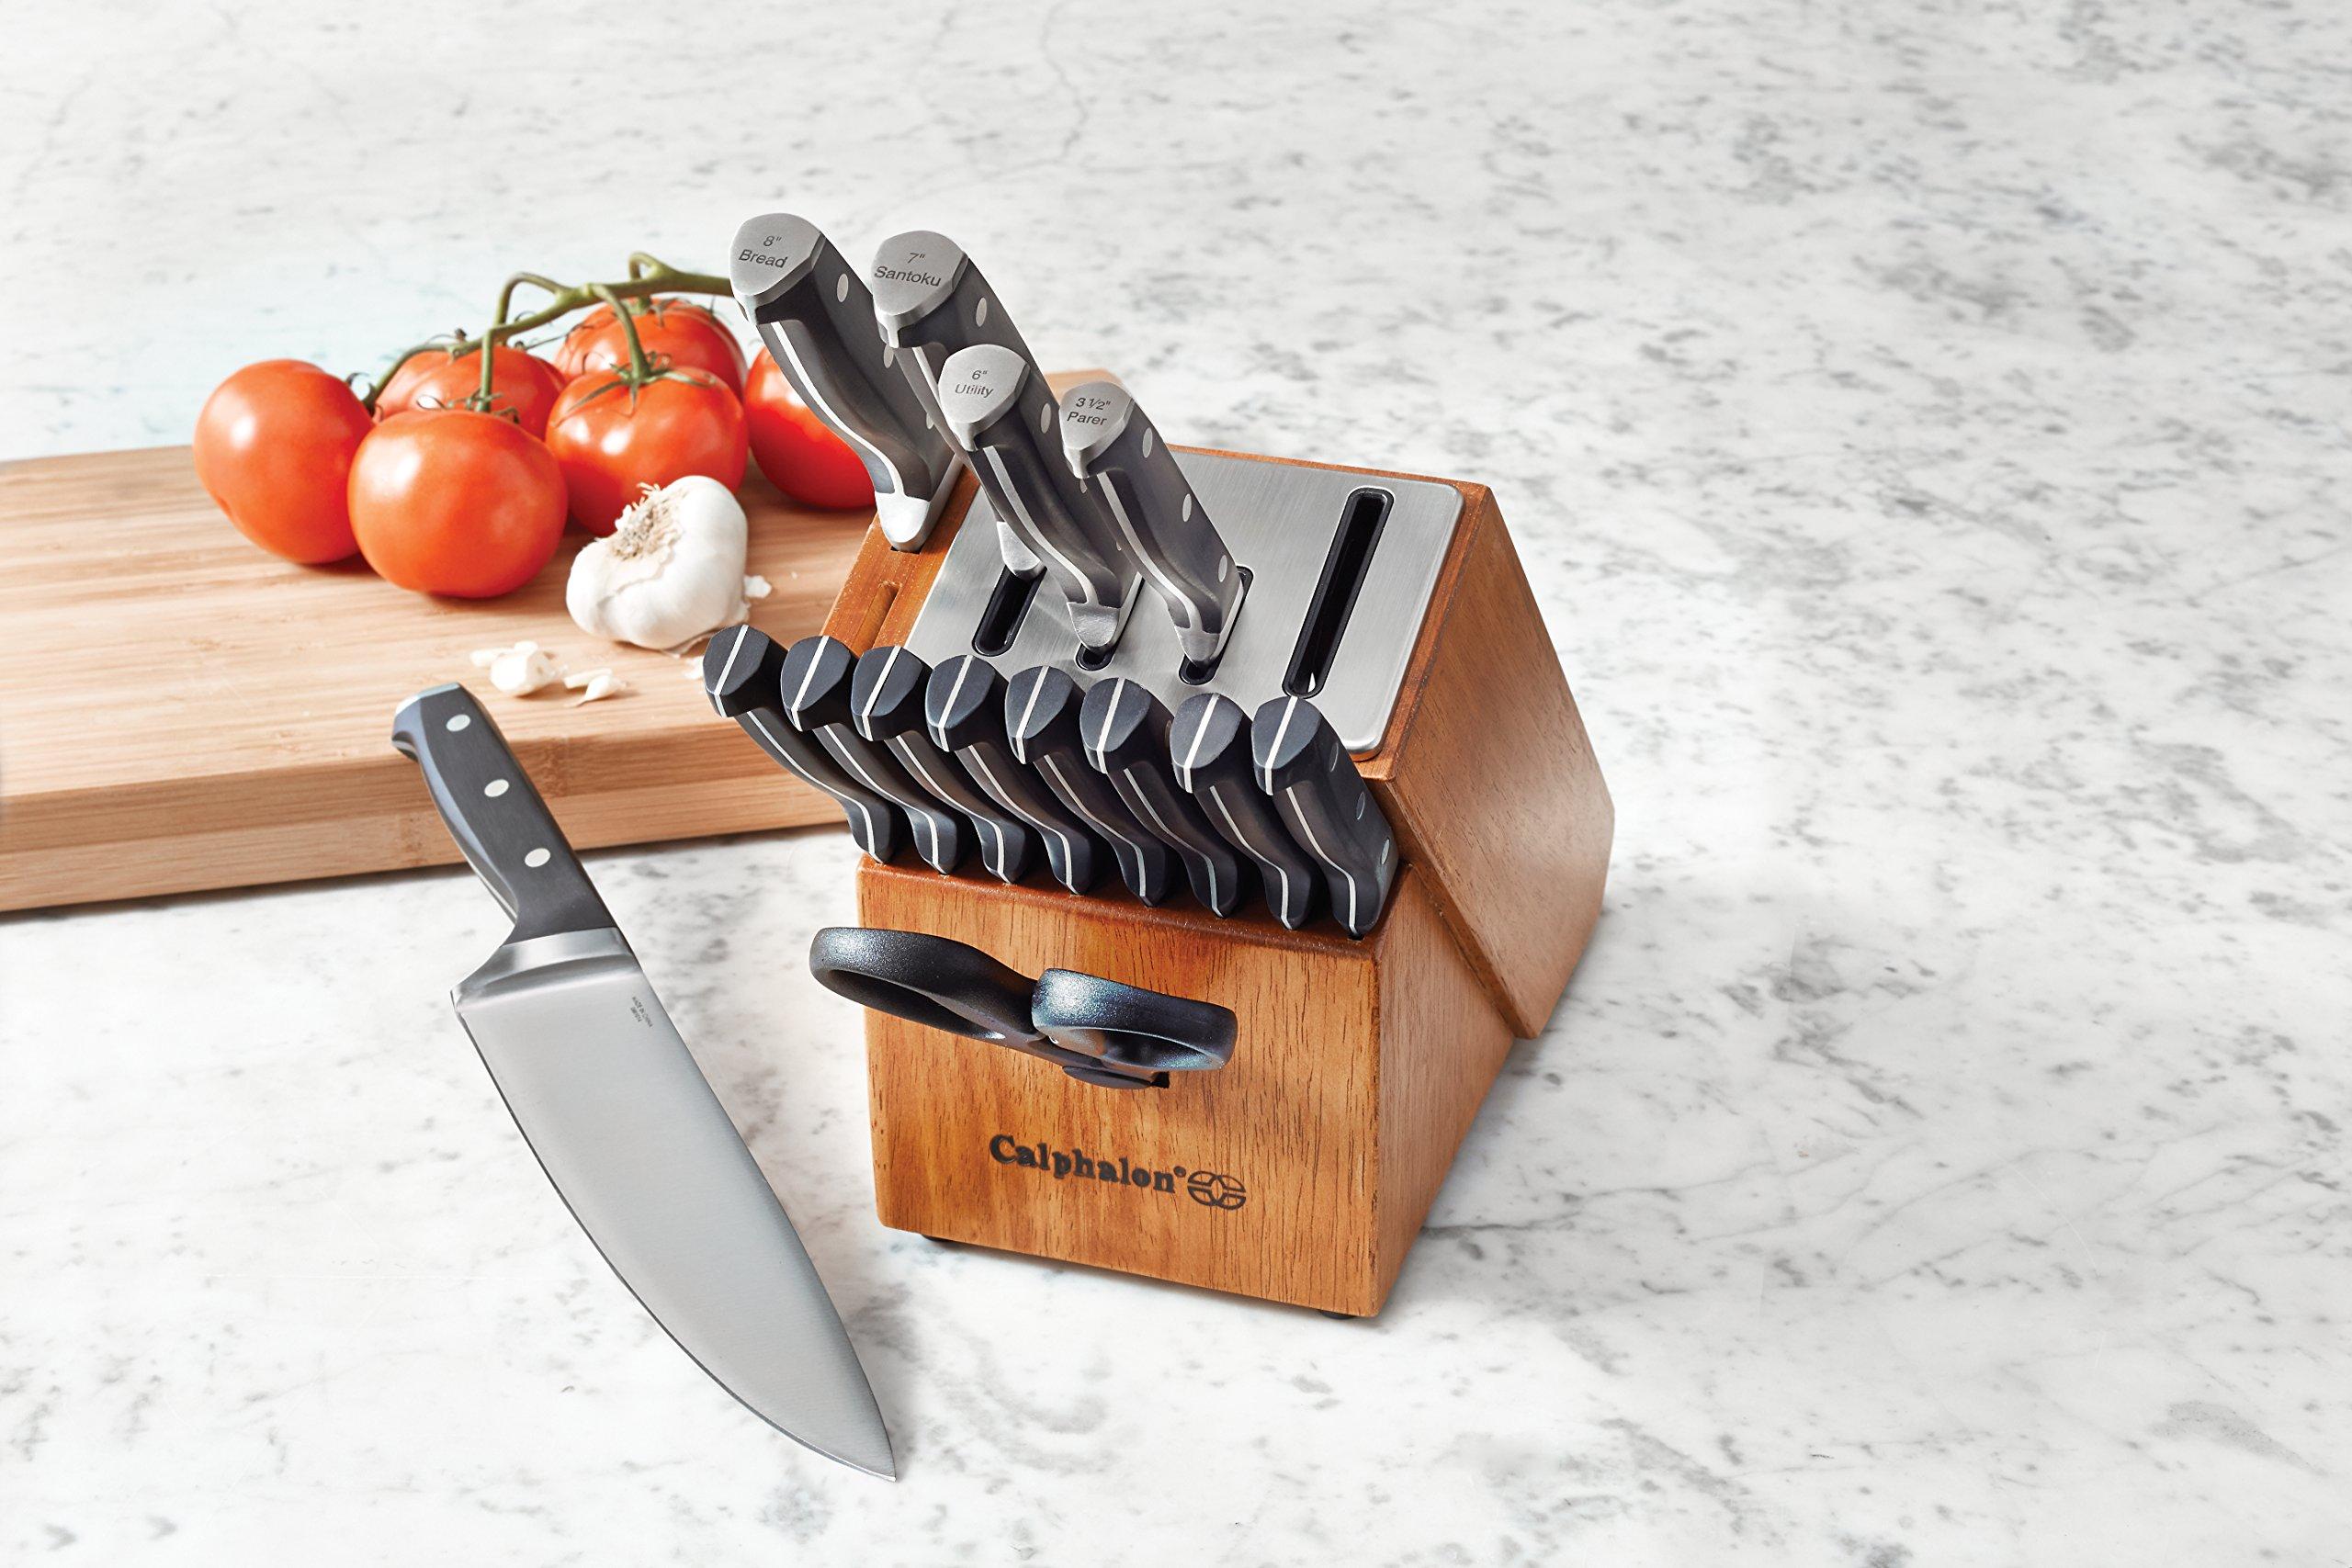 Calphalon Classic Self-Sharpening 15-pc. Cutlery Knife Block Set by Calphalon (Image #3)